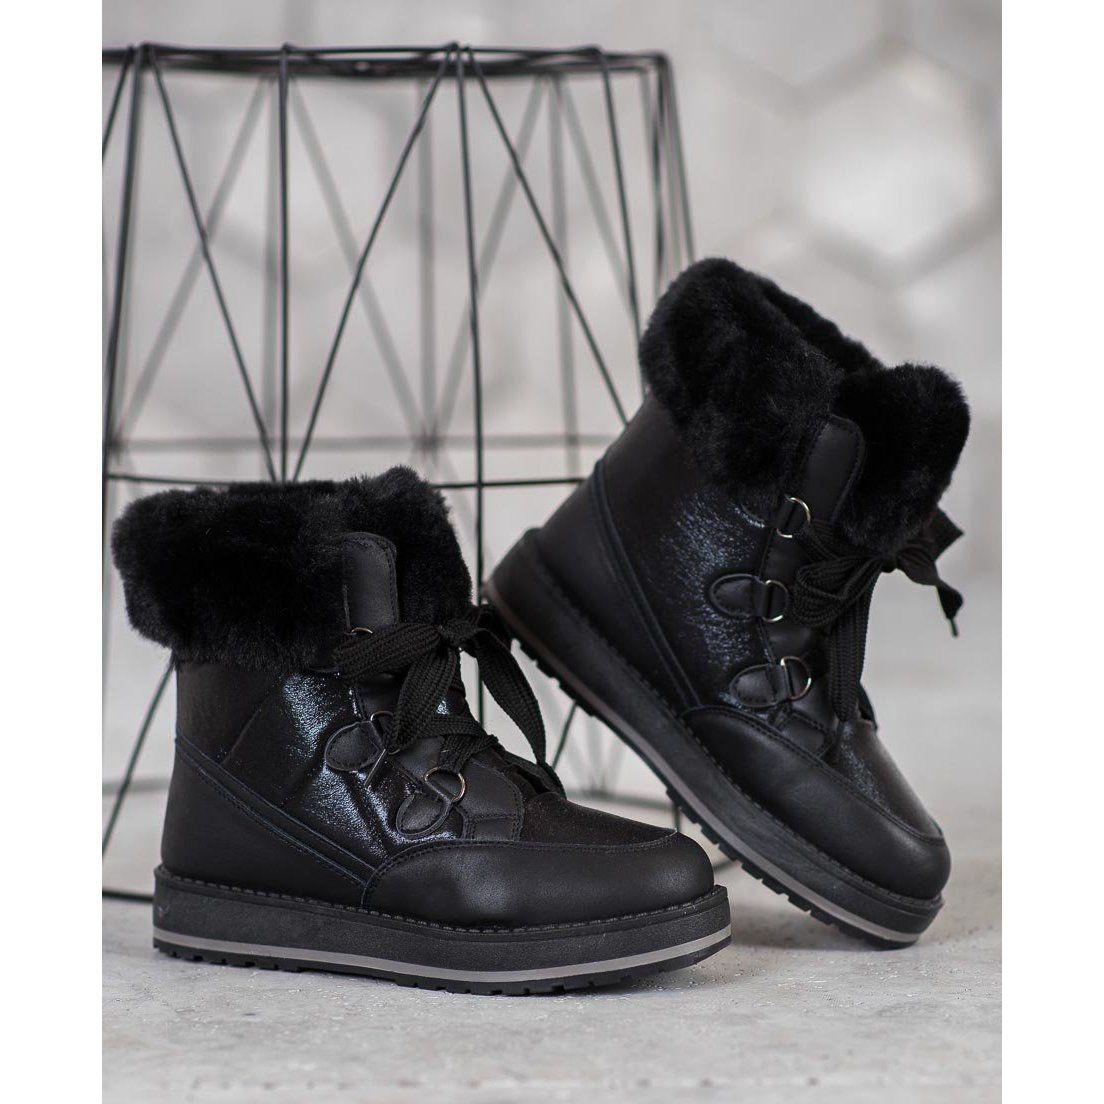 Muto Blyszczace Sniegowce Czarne Boots Combat Boots Sorel Winter Boot